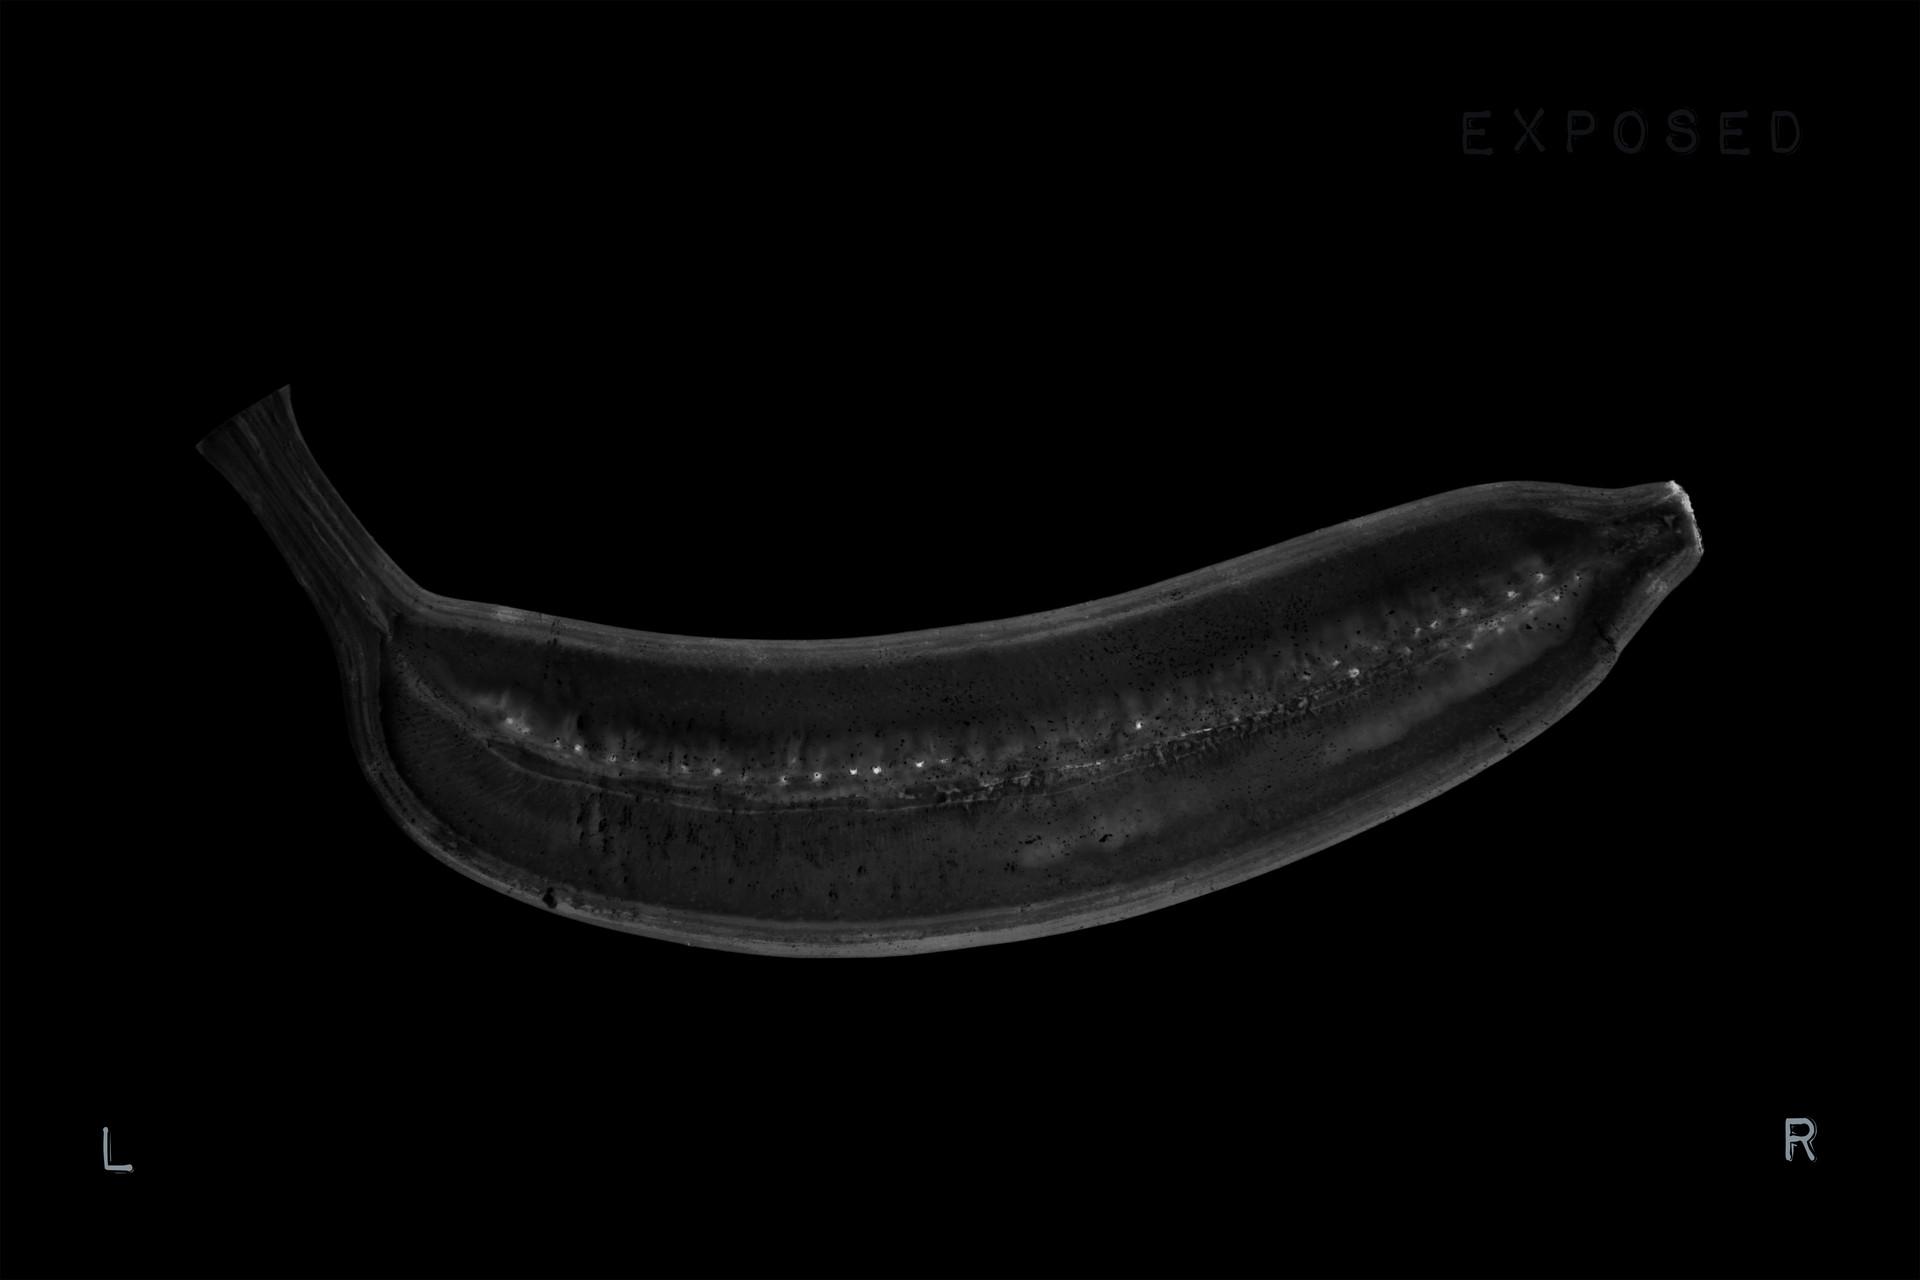 BananaExposed.jpg